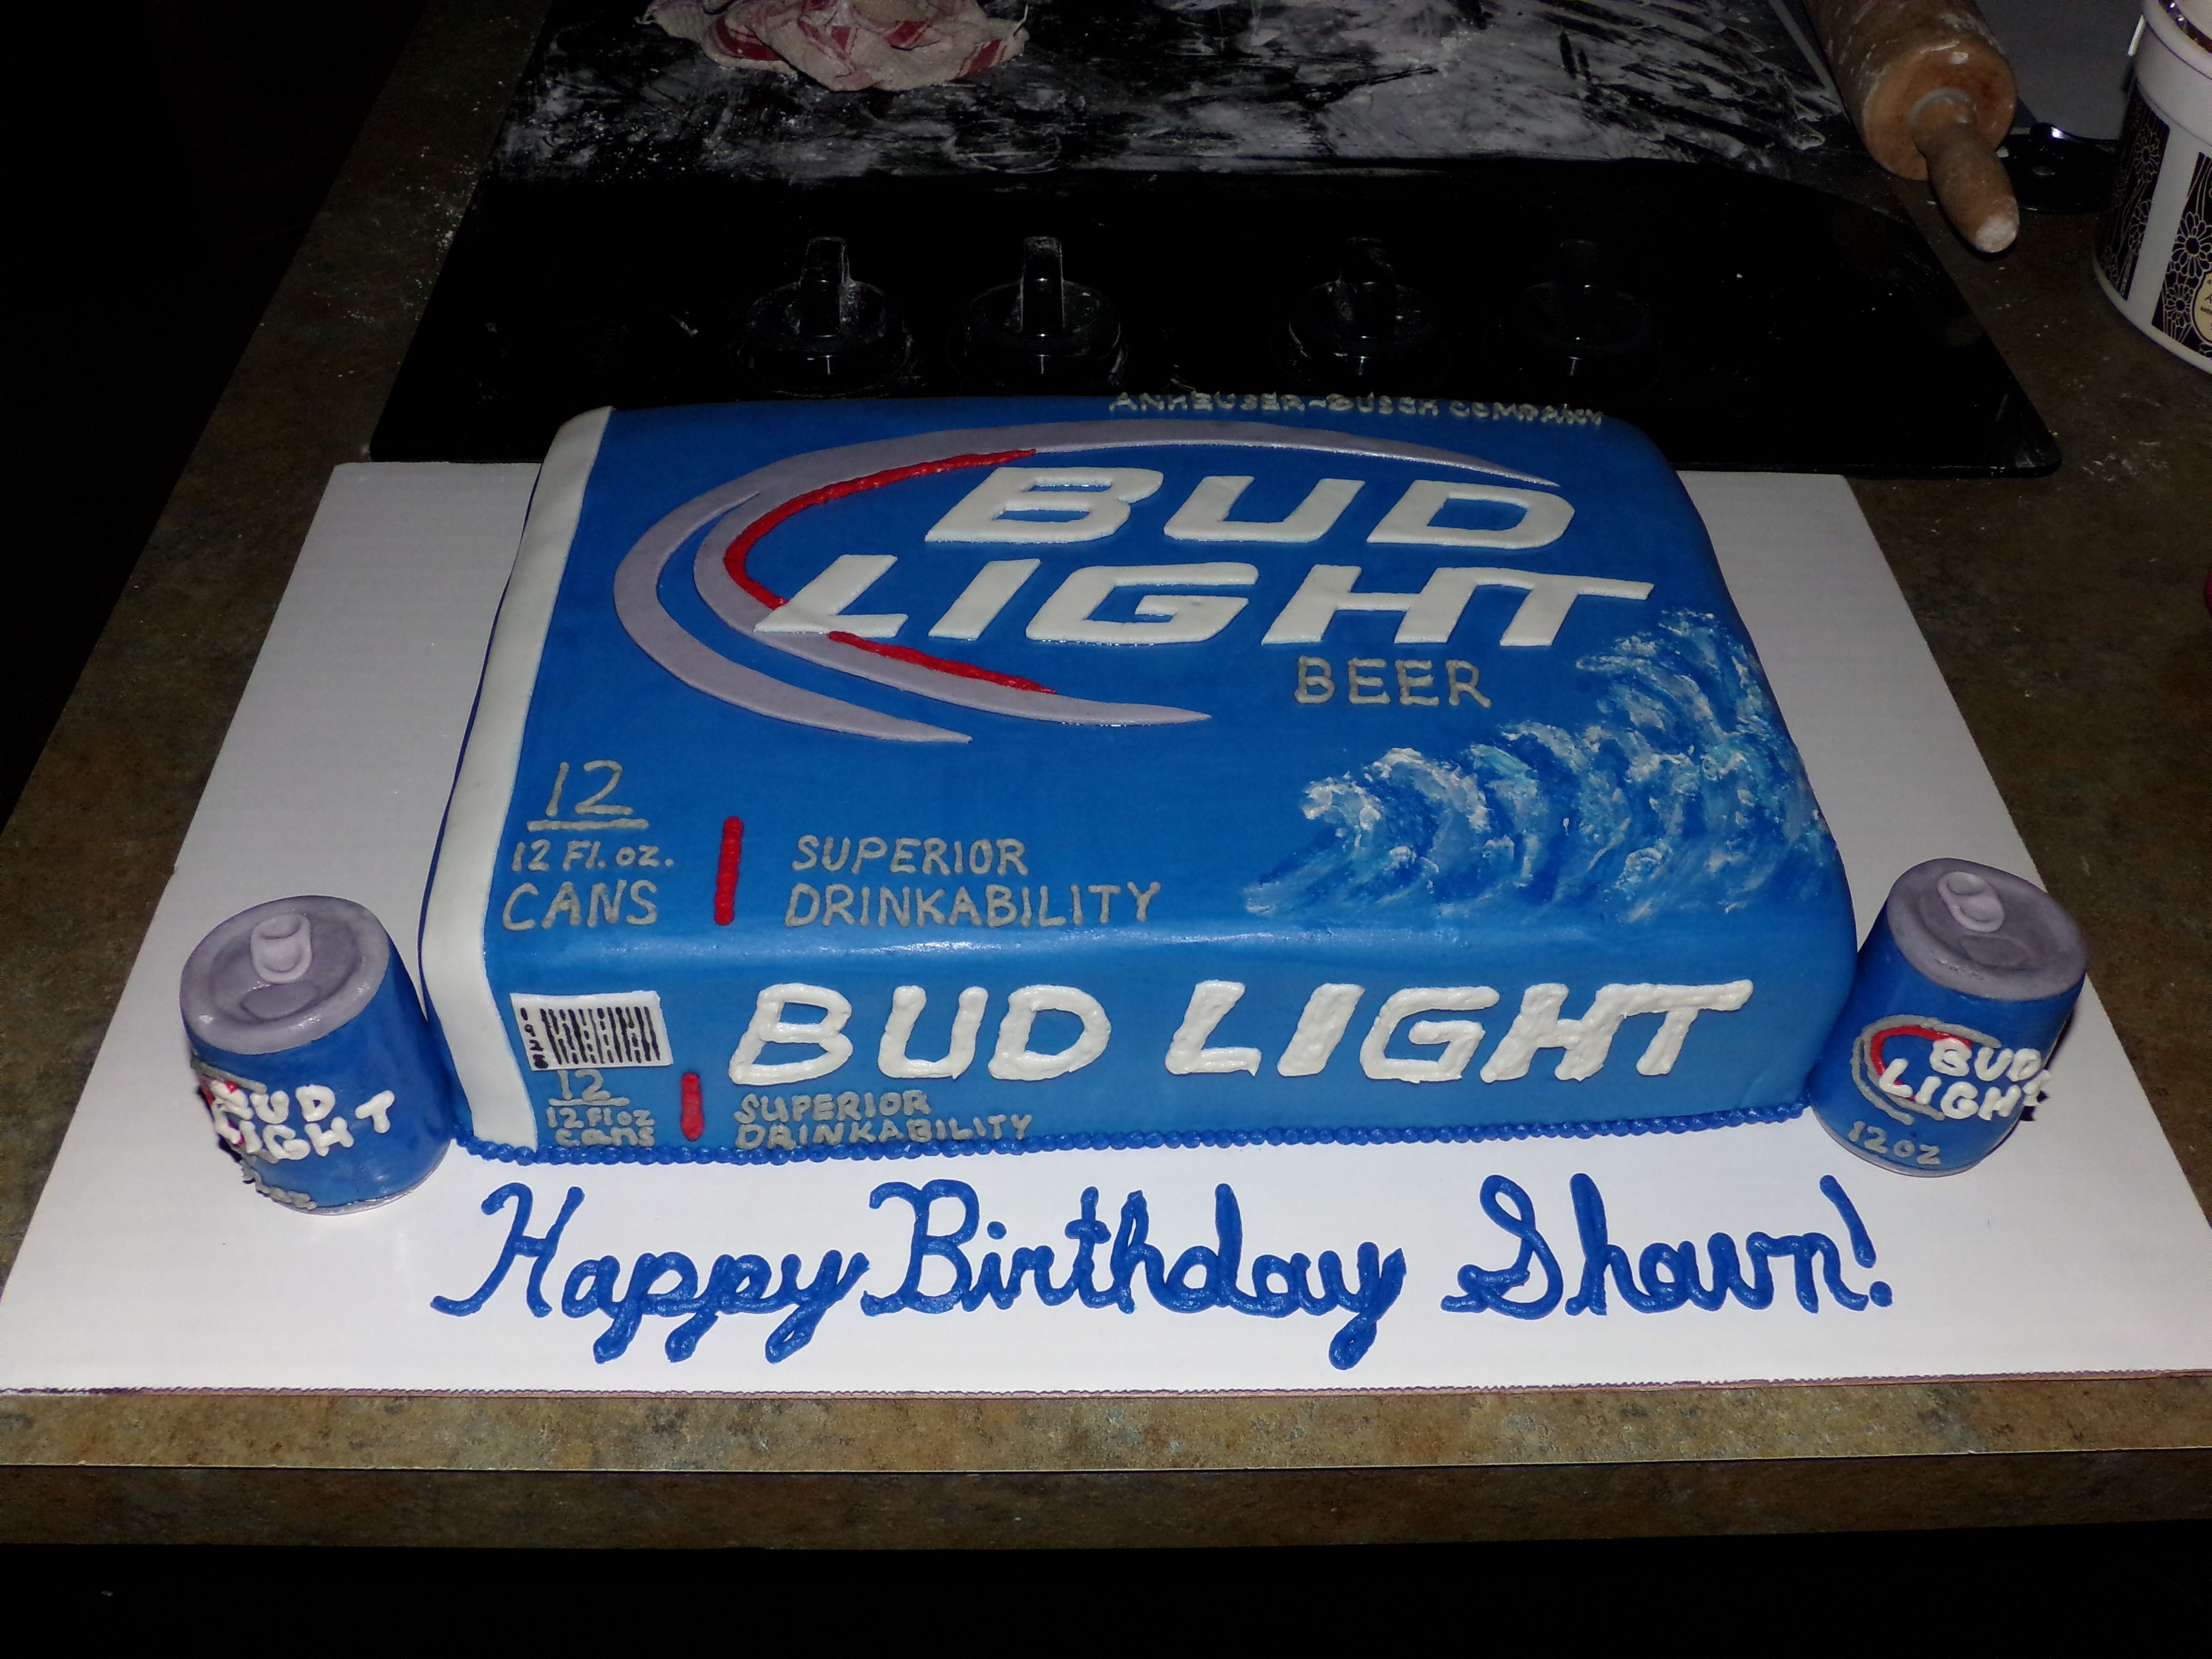 Awe Inspiring 12 Pk Bud Light Box And Beer Cans Cake Bud Light Cake Beer Can Funny Birthday Cards Online Elaedamsfinfo